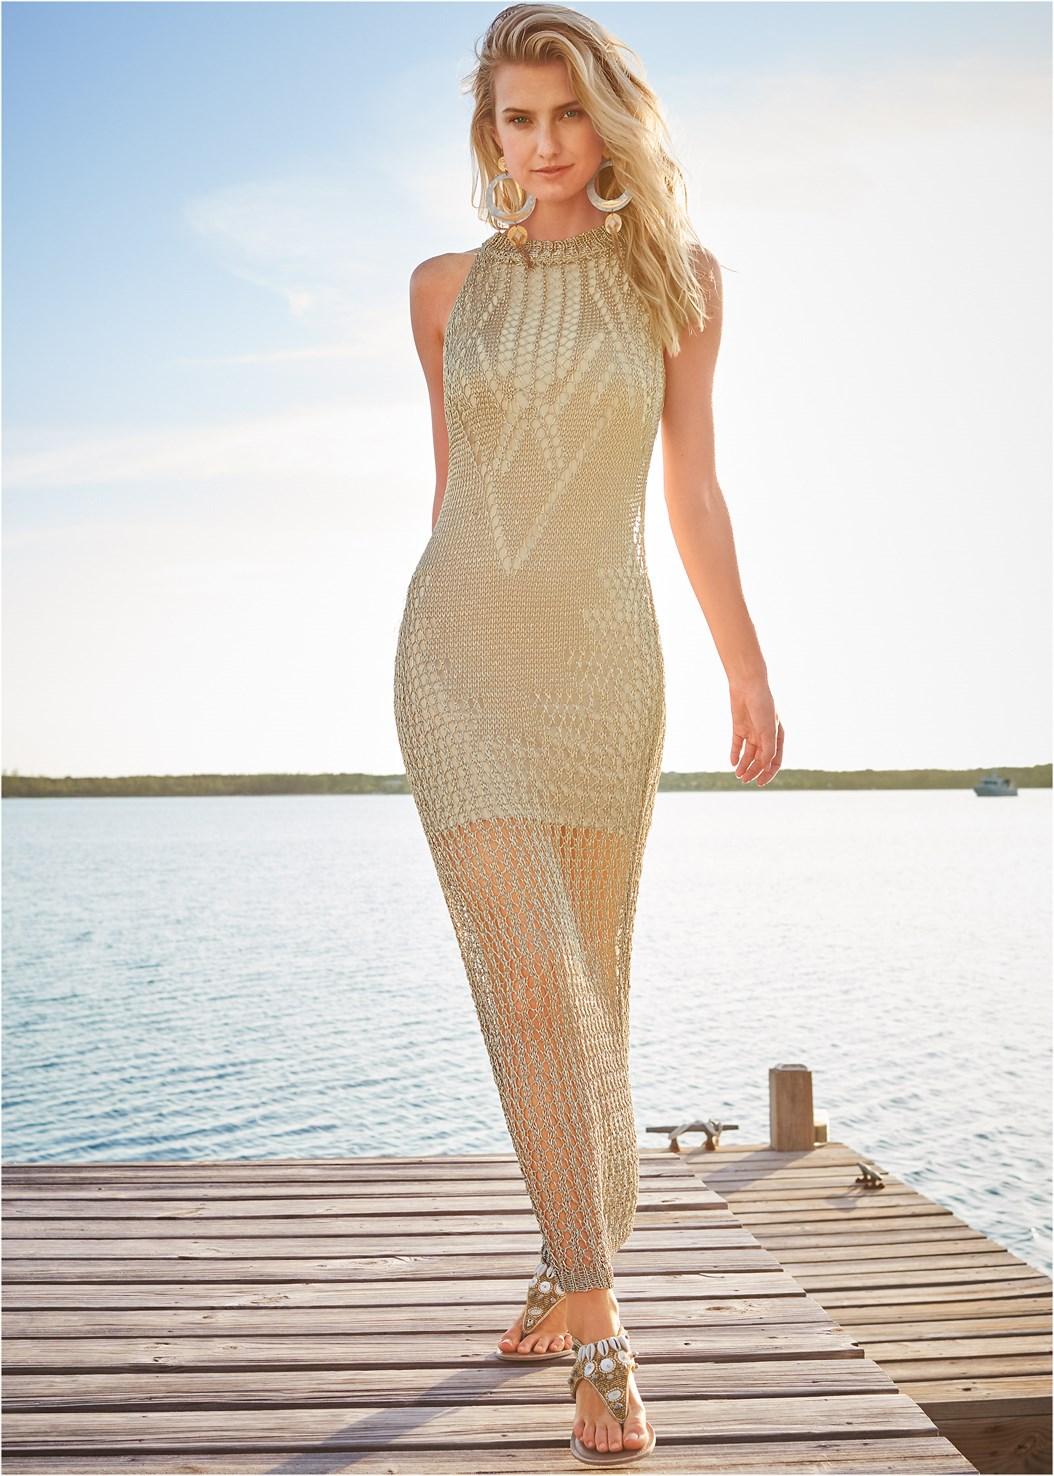 Metallic Crochet Dress,Oversized Tassel Earrings